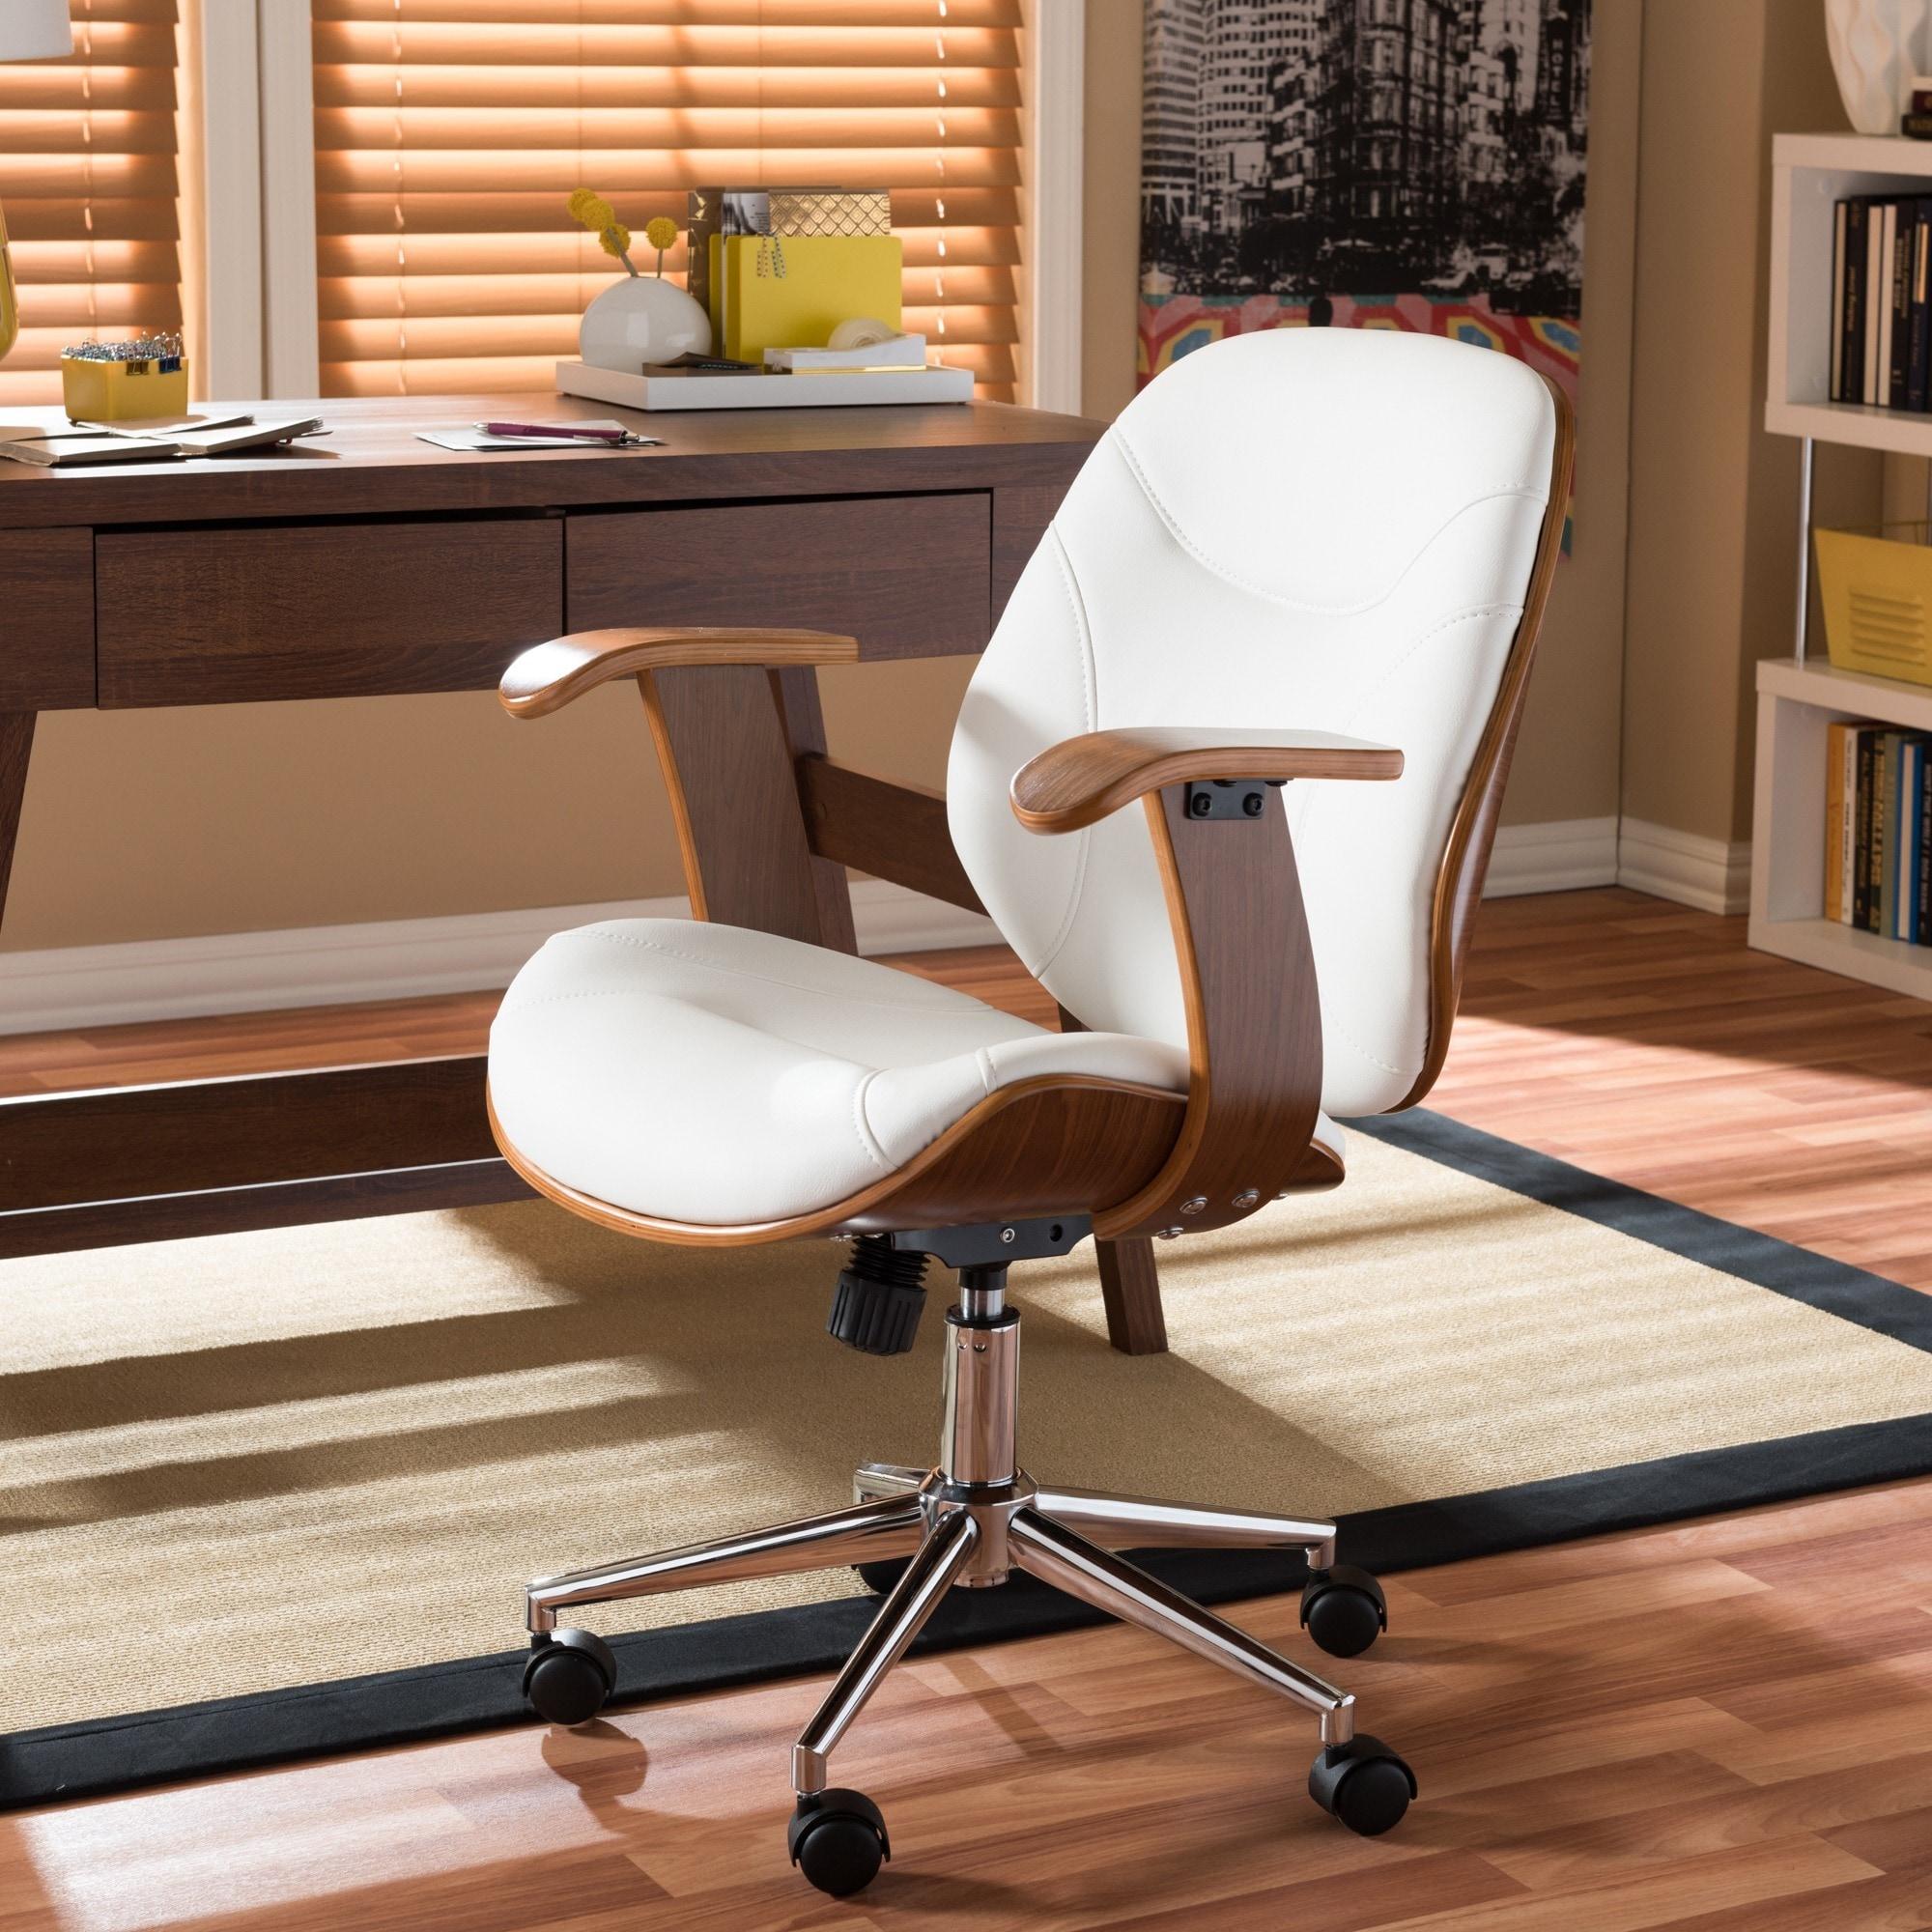 Prime Baxton Studio Rathburn Walnut Frame Black Or White Faux Leather Modern Office Chair Interior Design Ideas Gentotryabchikinfo